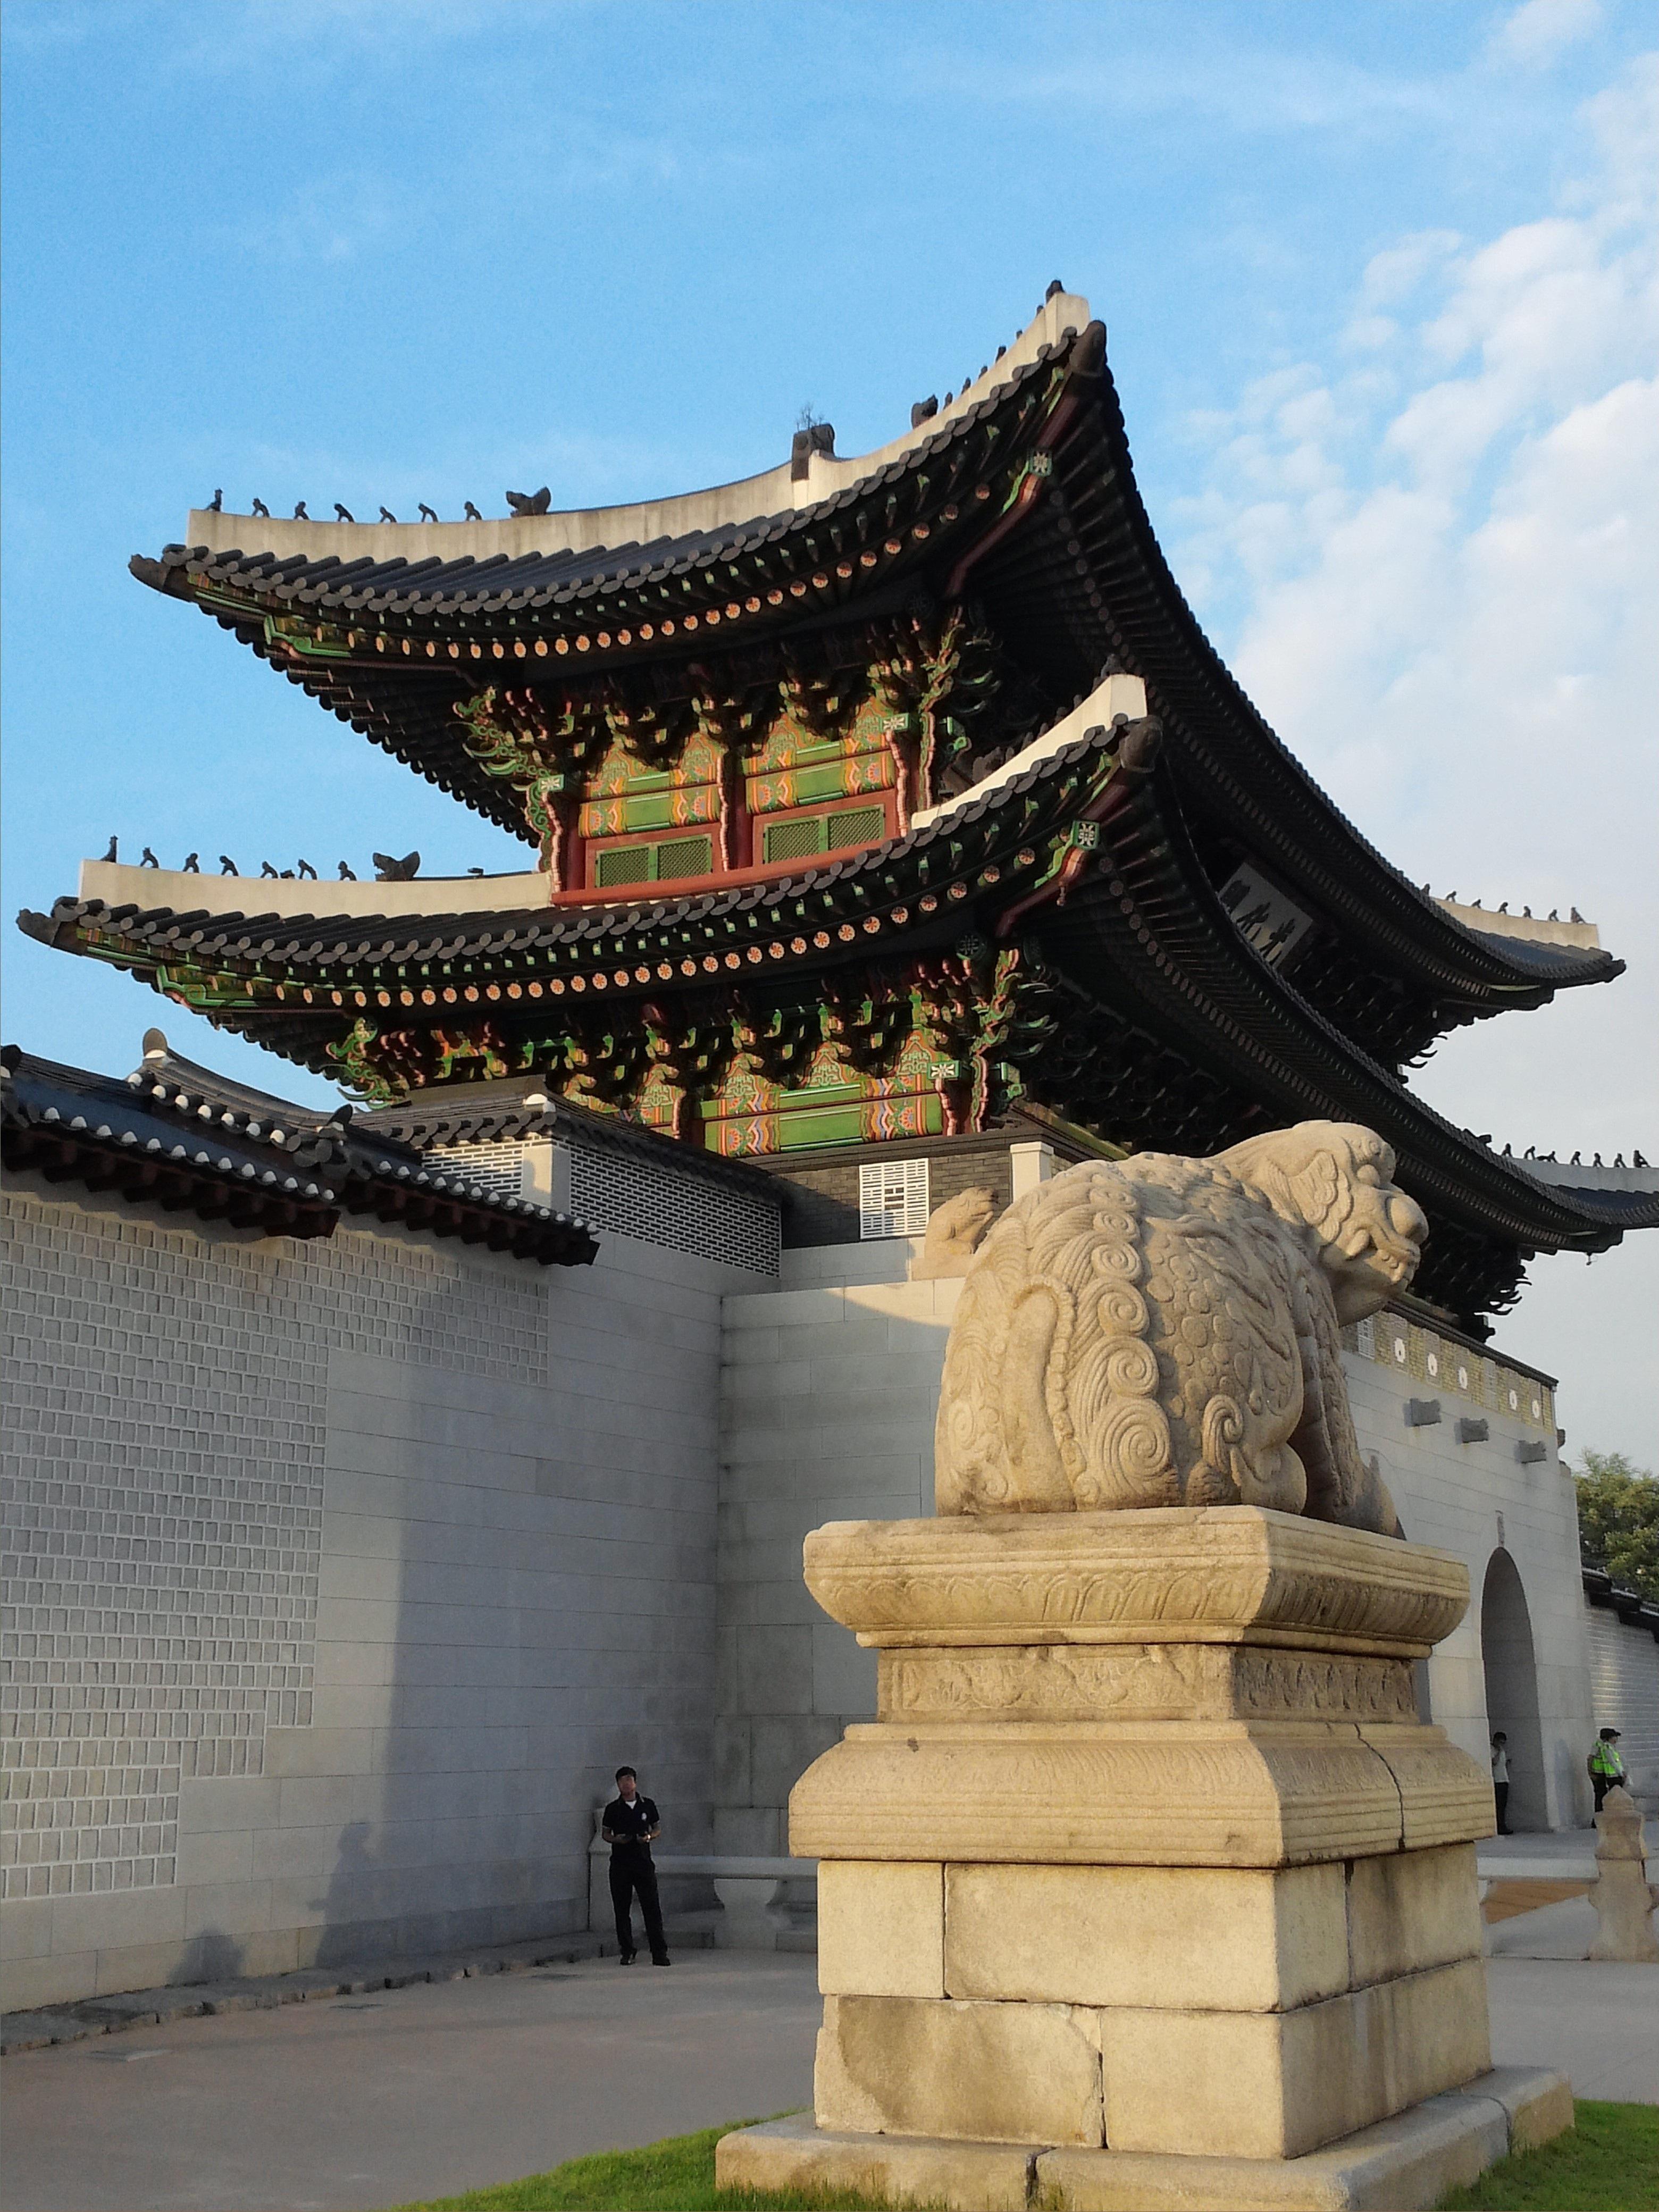 Tower Landmark Glow Tourism Place Of Worship Shrine Hatch Chinese Architecture Pagoda Seoul Forbidden City Old Fashioned Republic Korea